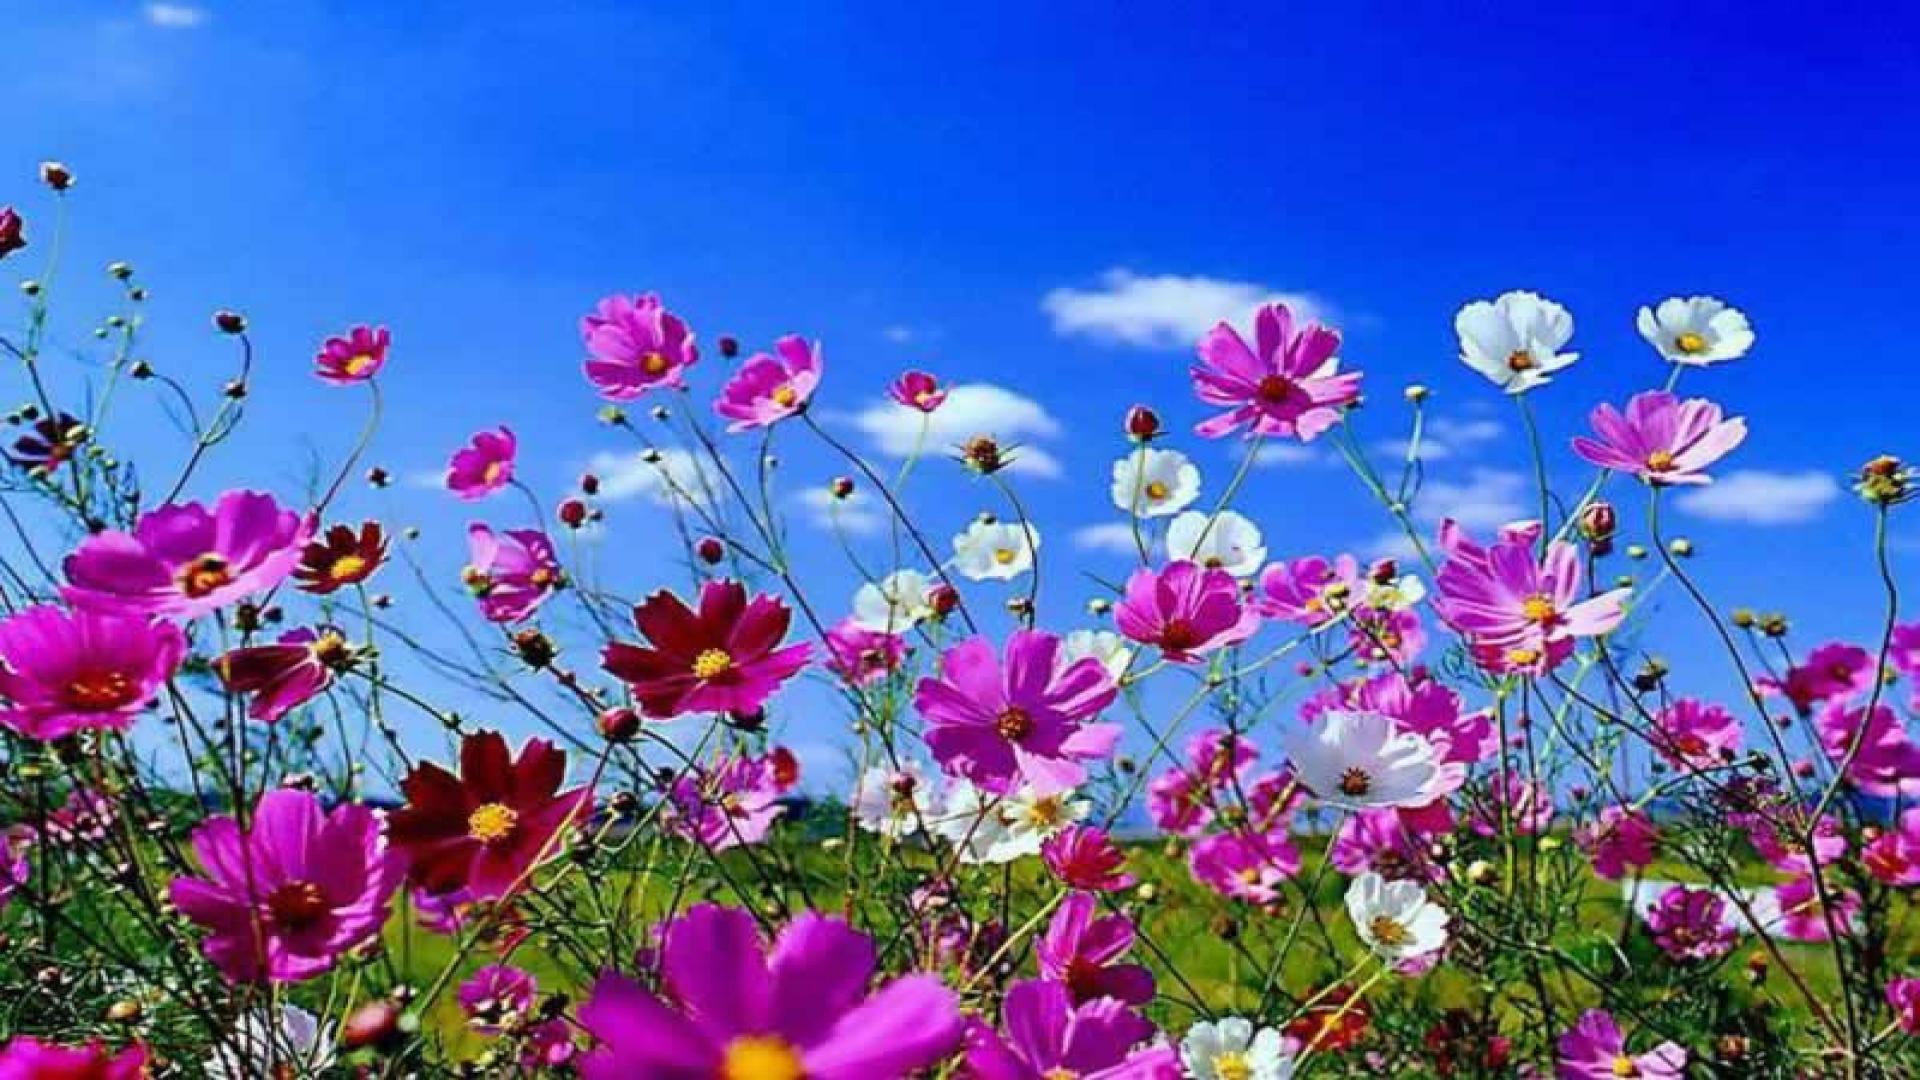 free desktop spring flowers hd wallpaper for your desktop background 1920x1080